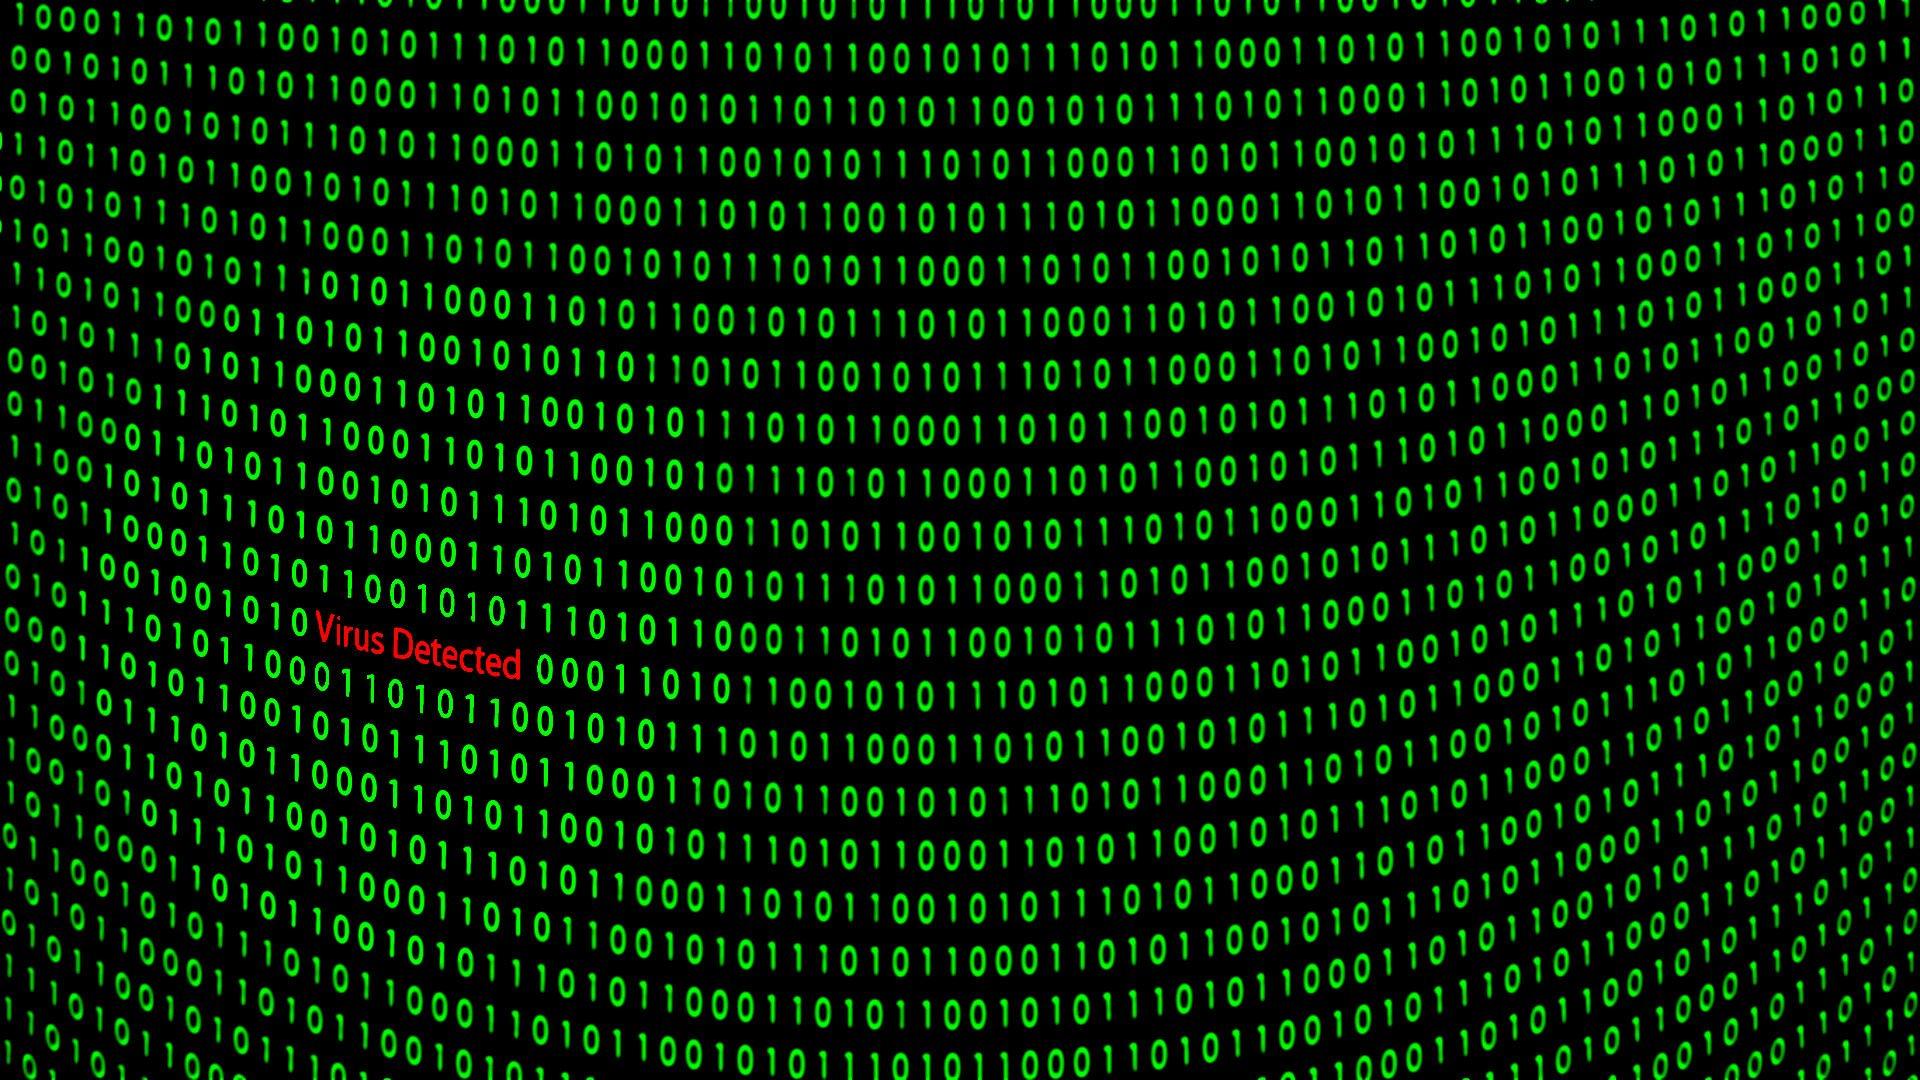 hack wallpaper Download 1920x1080